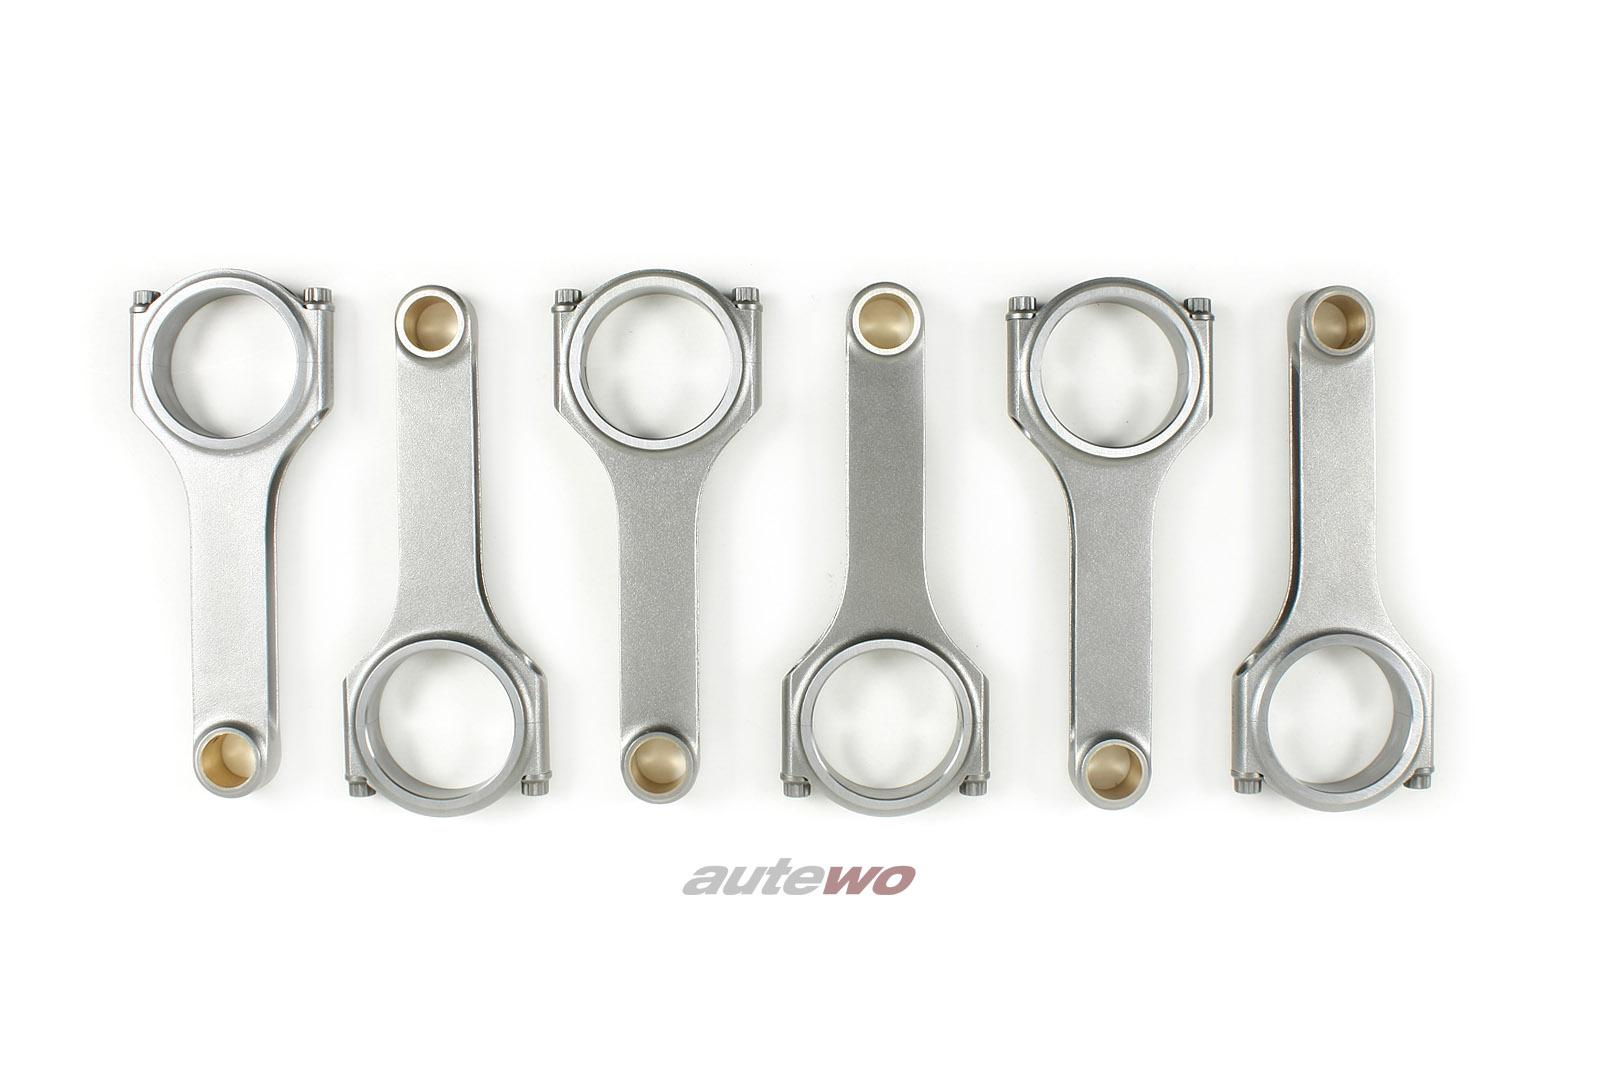 Audi RS4 B5 6 Zylinder 2.7l Biturbo FCP H-Schaft-Pleuel 154mm